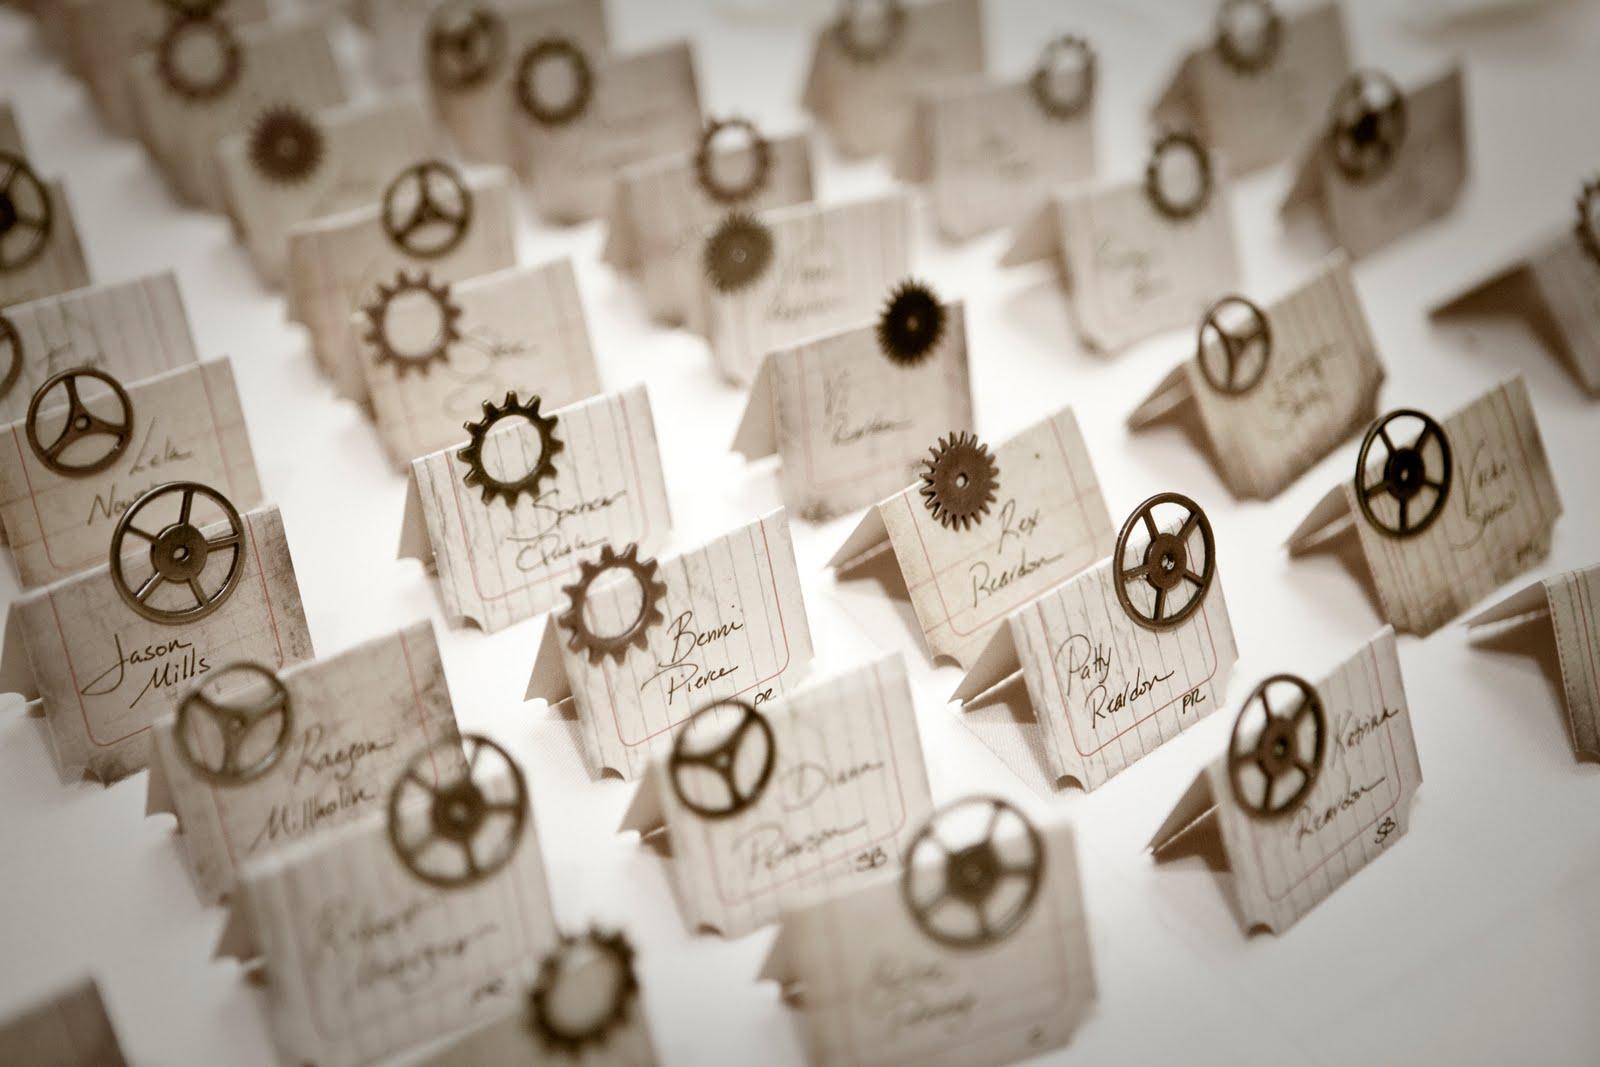 Поздравление от панков на свадьбу